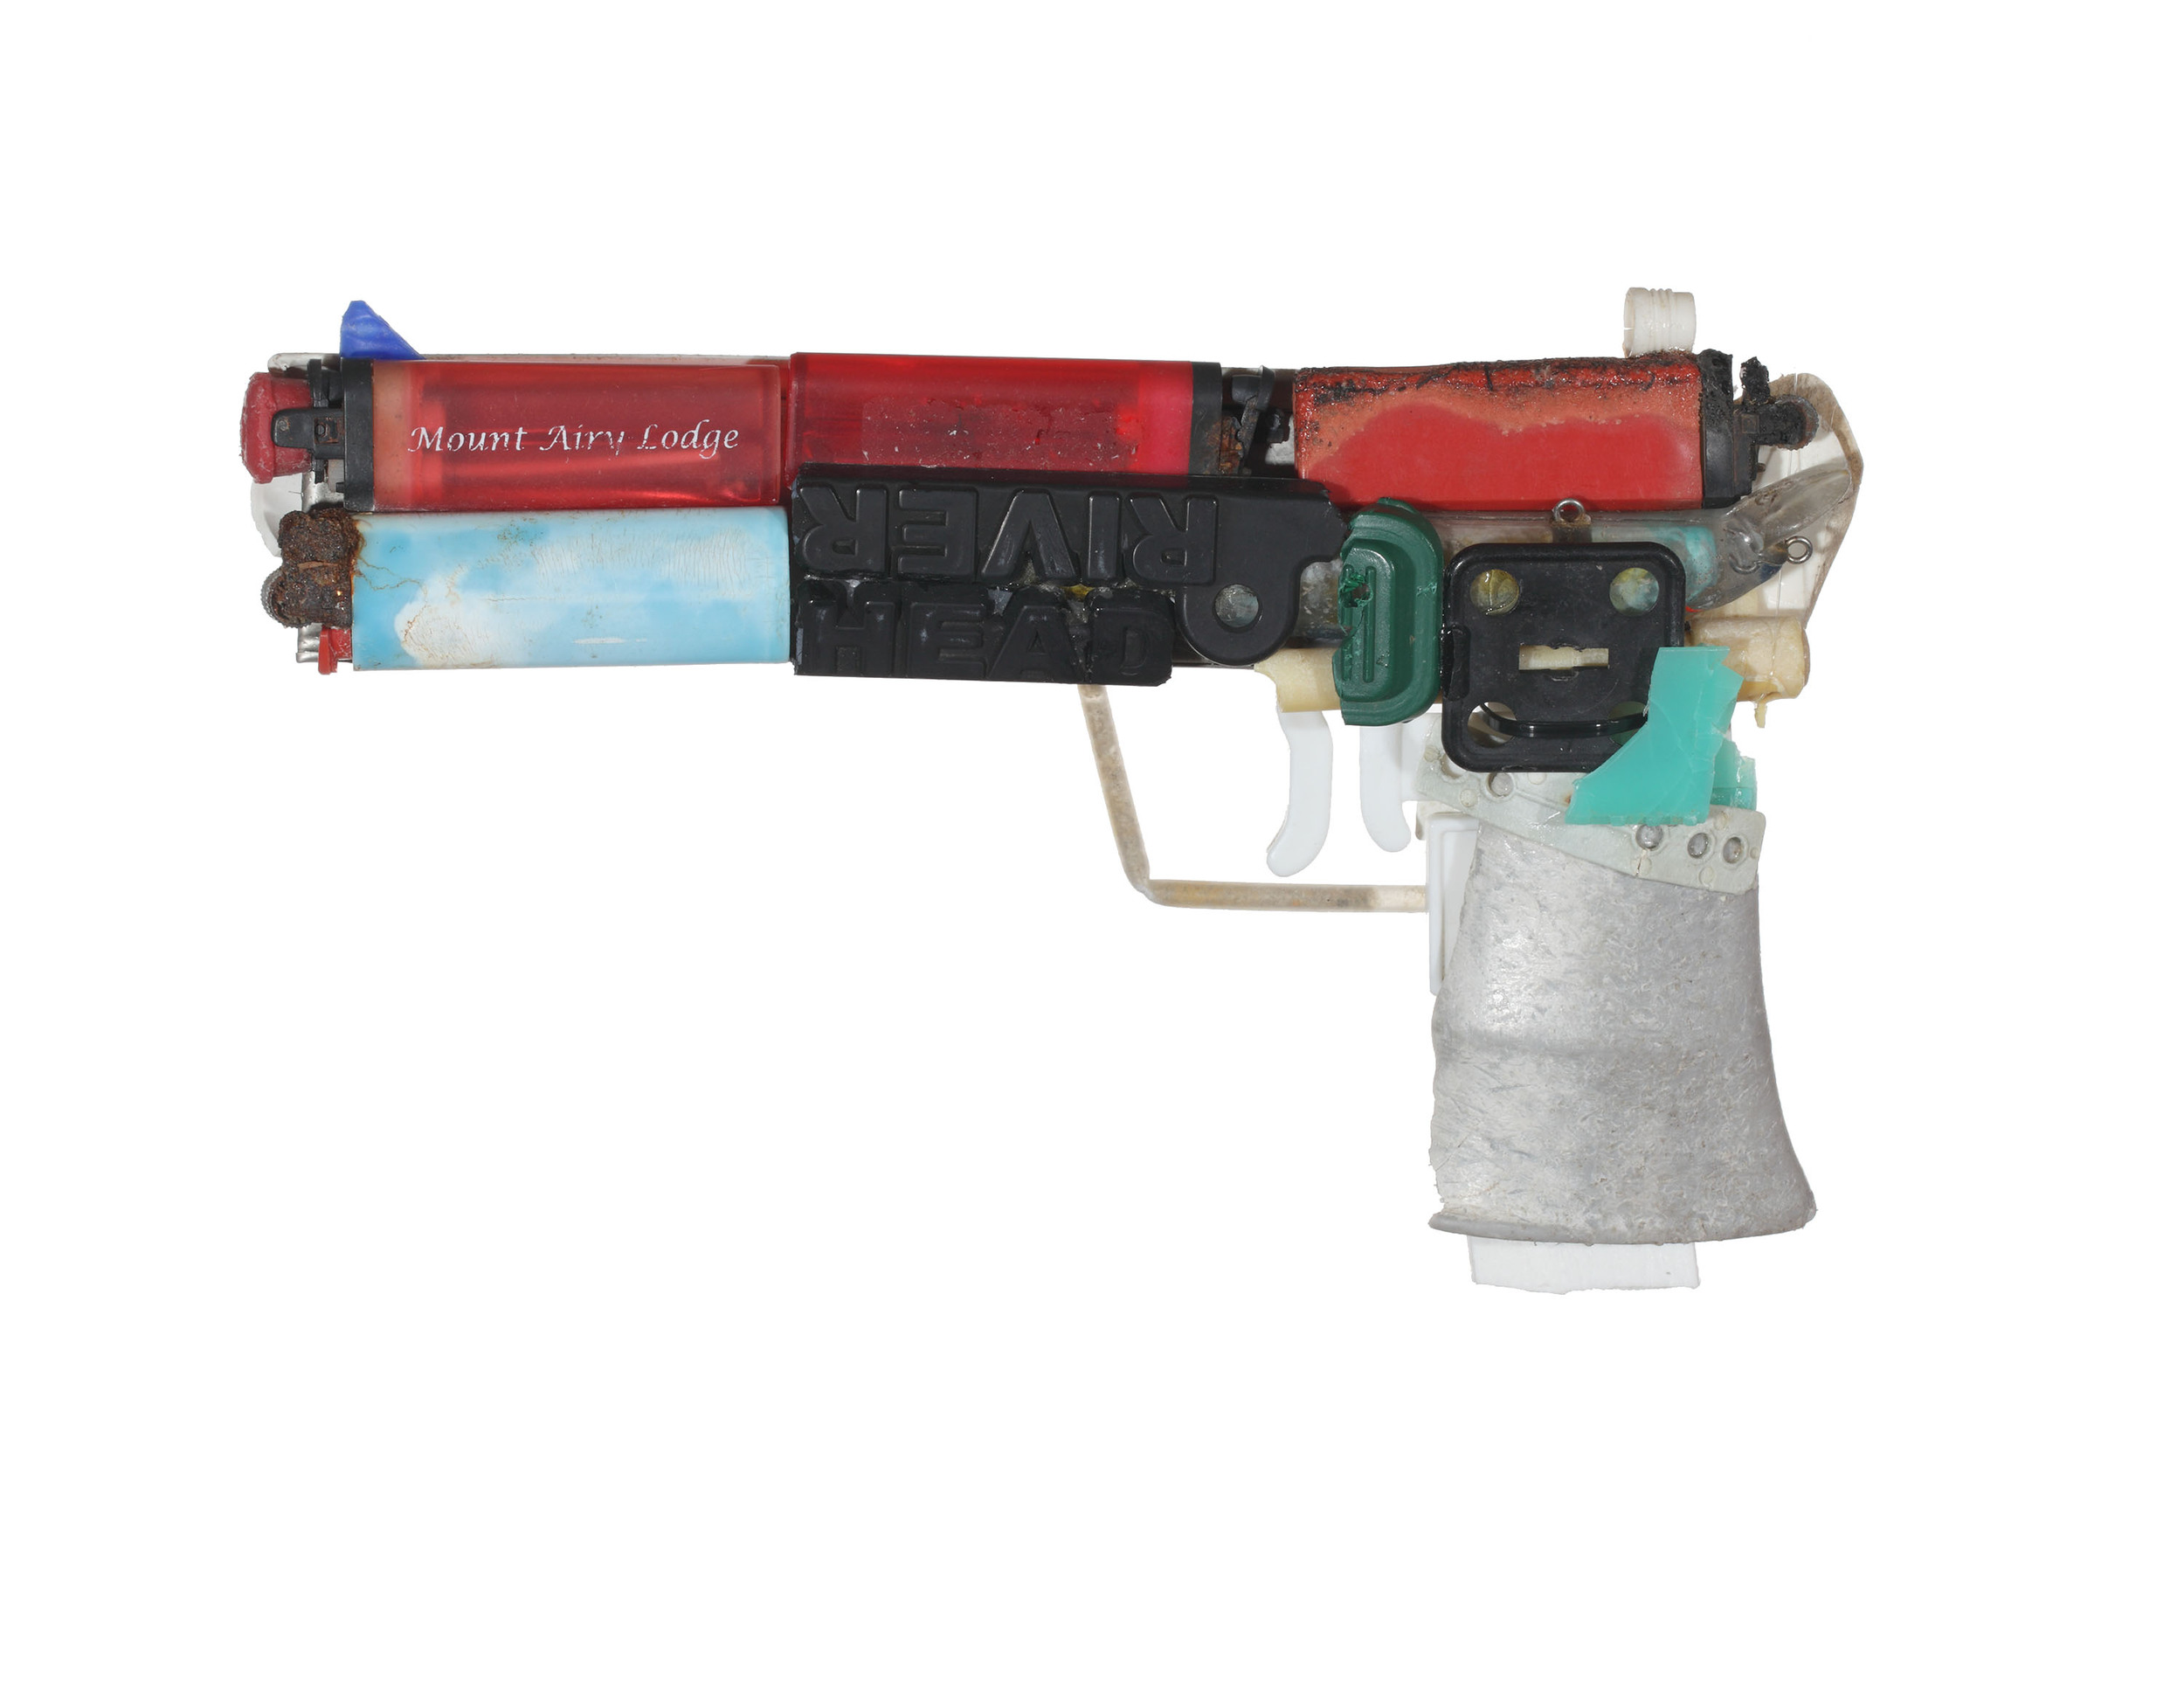 Glock Made From Hurricane Sandy Beach Trash 2.jpg